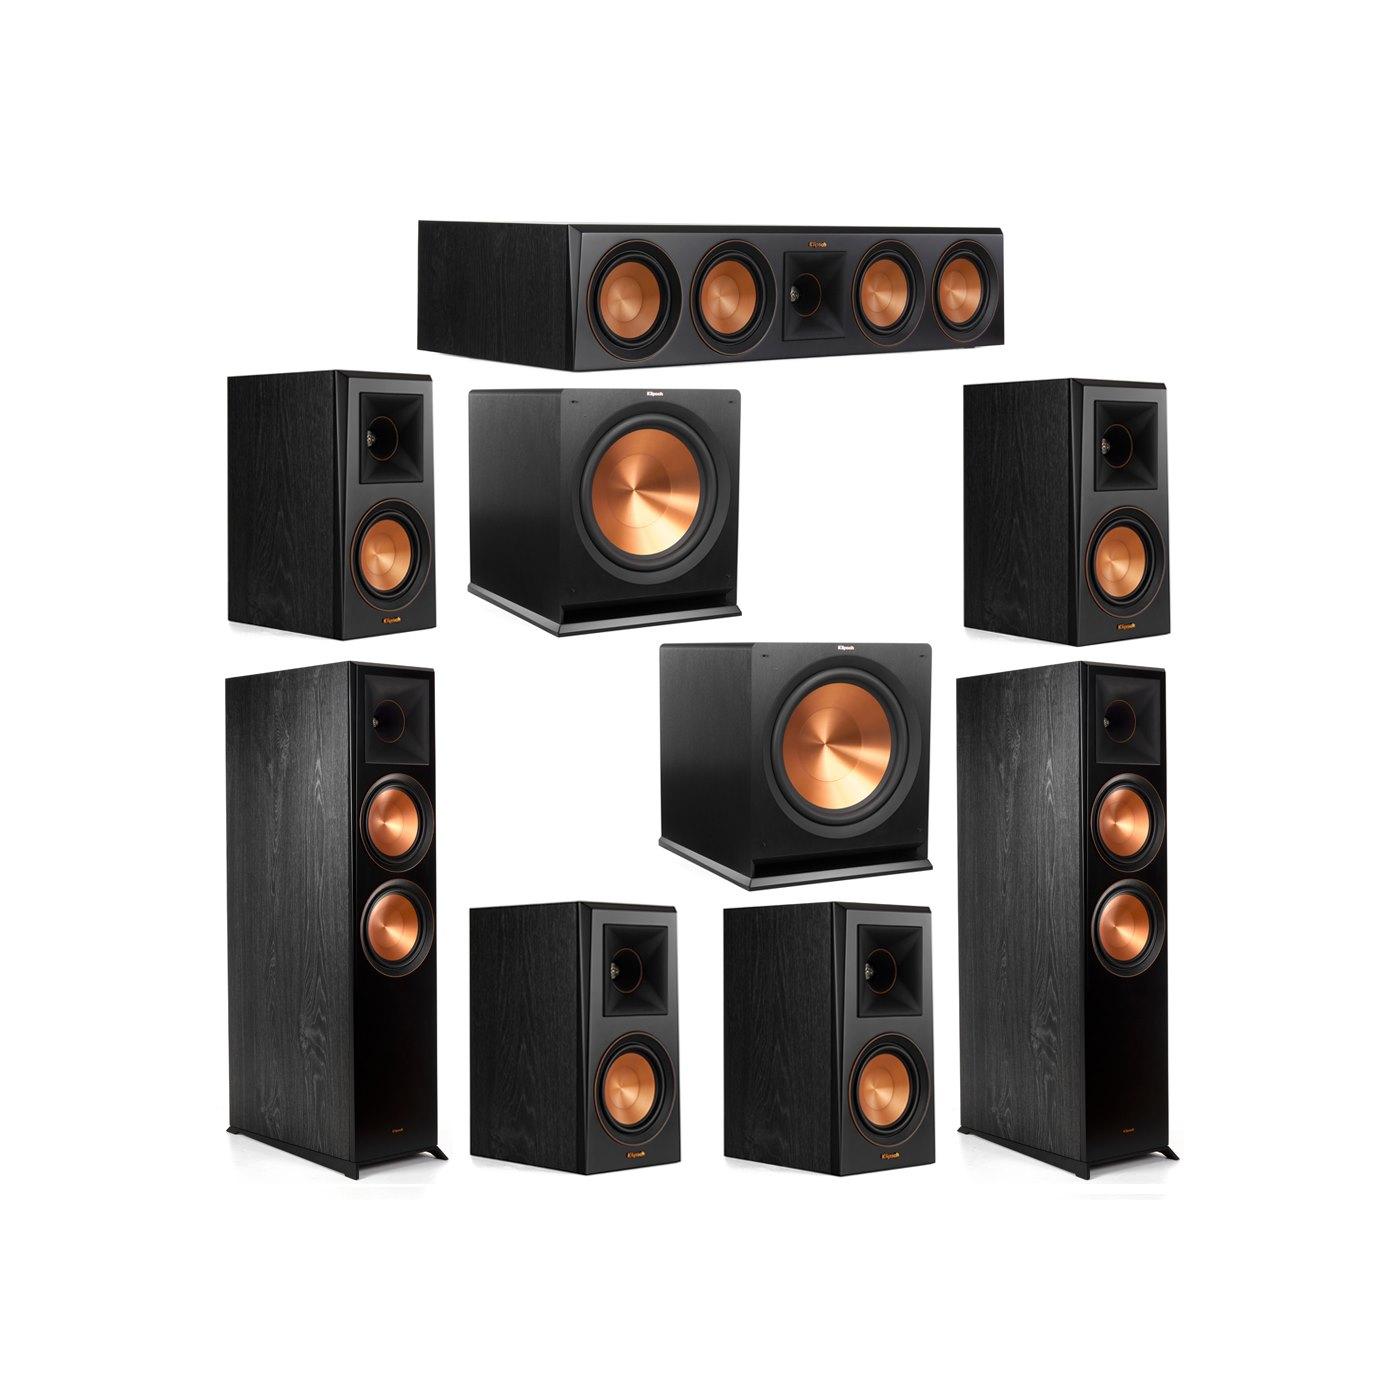 Klipsch 7.2 System with 2 RP-8000F Floorstanding Speakers, 1 Klipsch RP-504C Center Speaker, 4 Klipsch RP-500M Surround Speakers, 2 Klipsch R-115SW Subwoofers